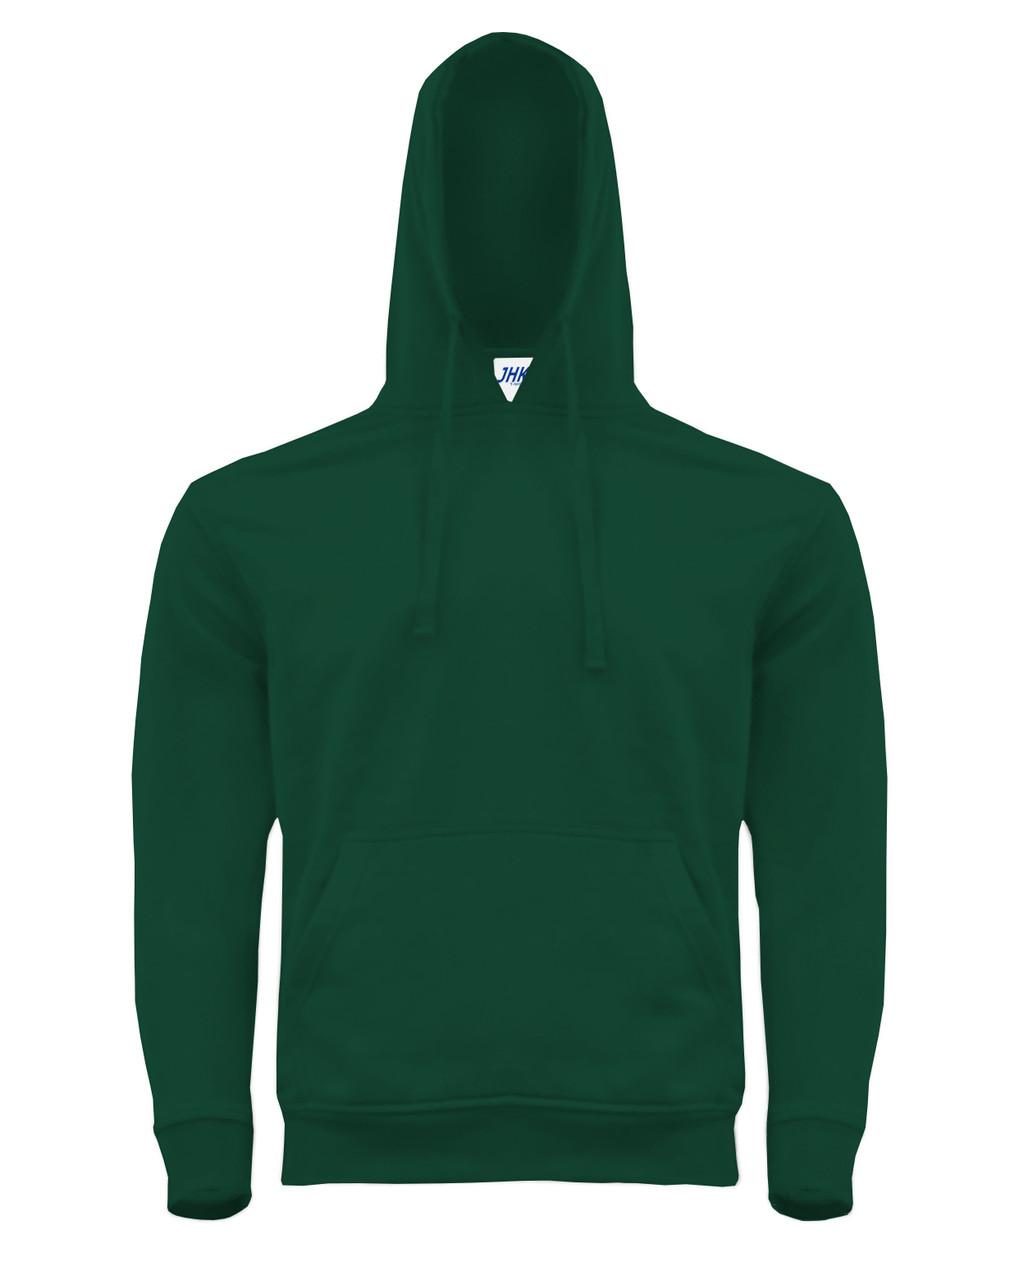 Мужская толстовка с капюшоном JHK KANGAROO цвет темно-зеленый (BG)